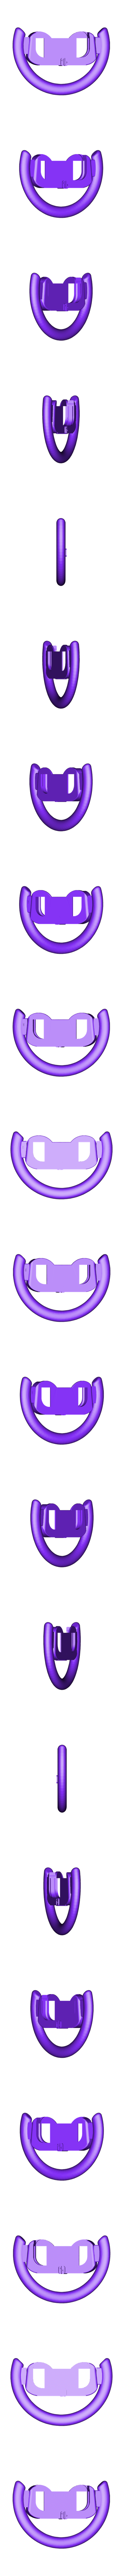 Joy-Con Wheel_ HalfWheel_Large.stl Télécharger fichier STL gratuit Joy-Con Wheel (Nintendo Switch) • Design imprimable en 3D, JosMiguelFernandes